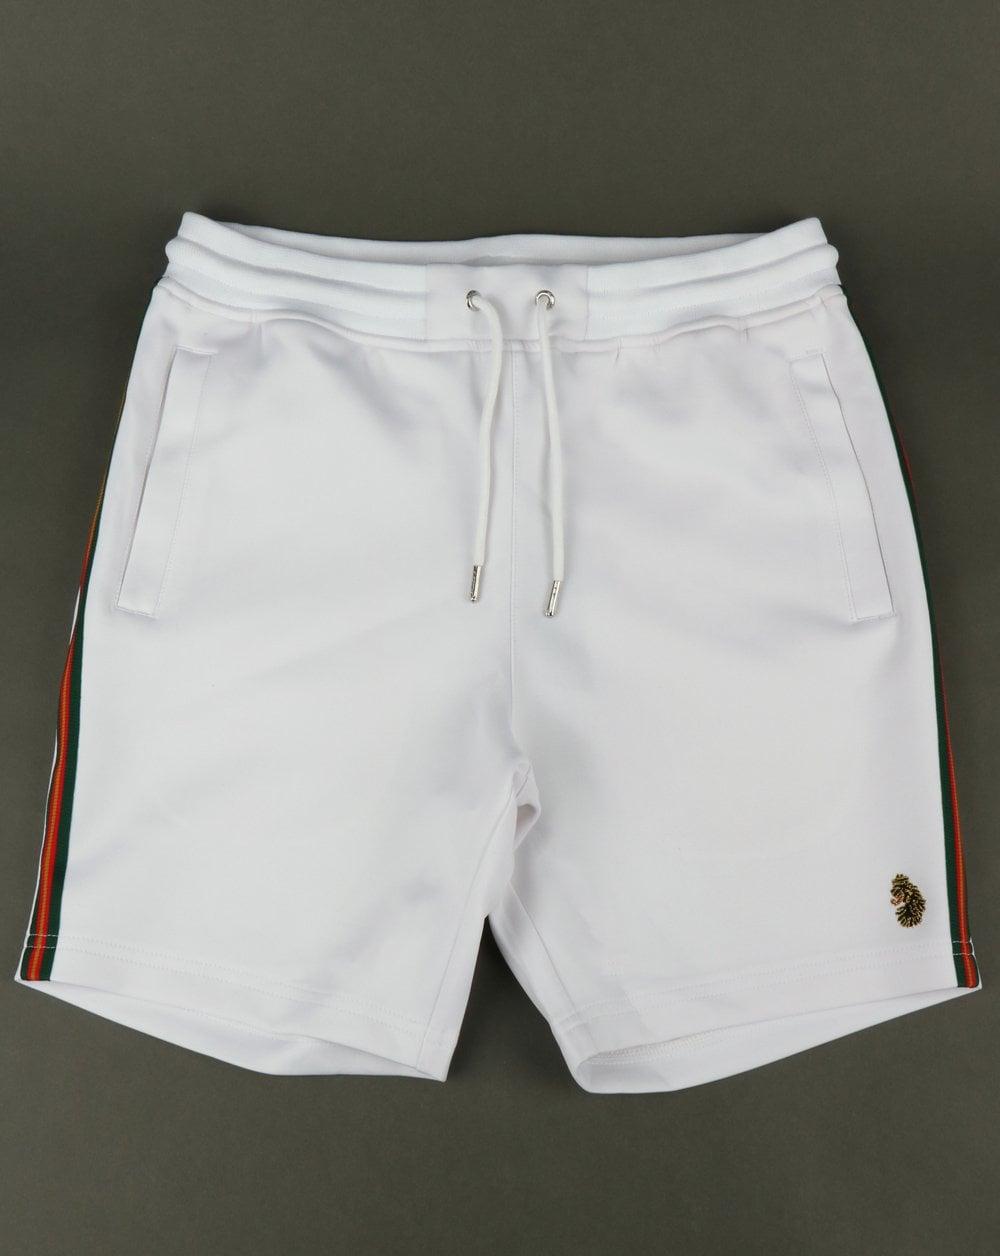 Luke Luke Tyson Vintage Tape Shorts White e0af9748a